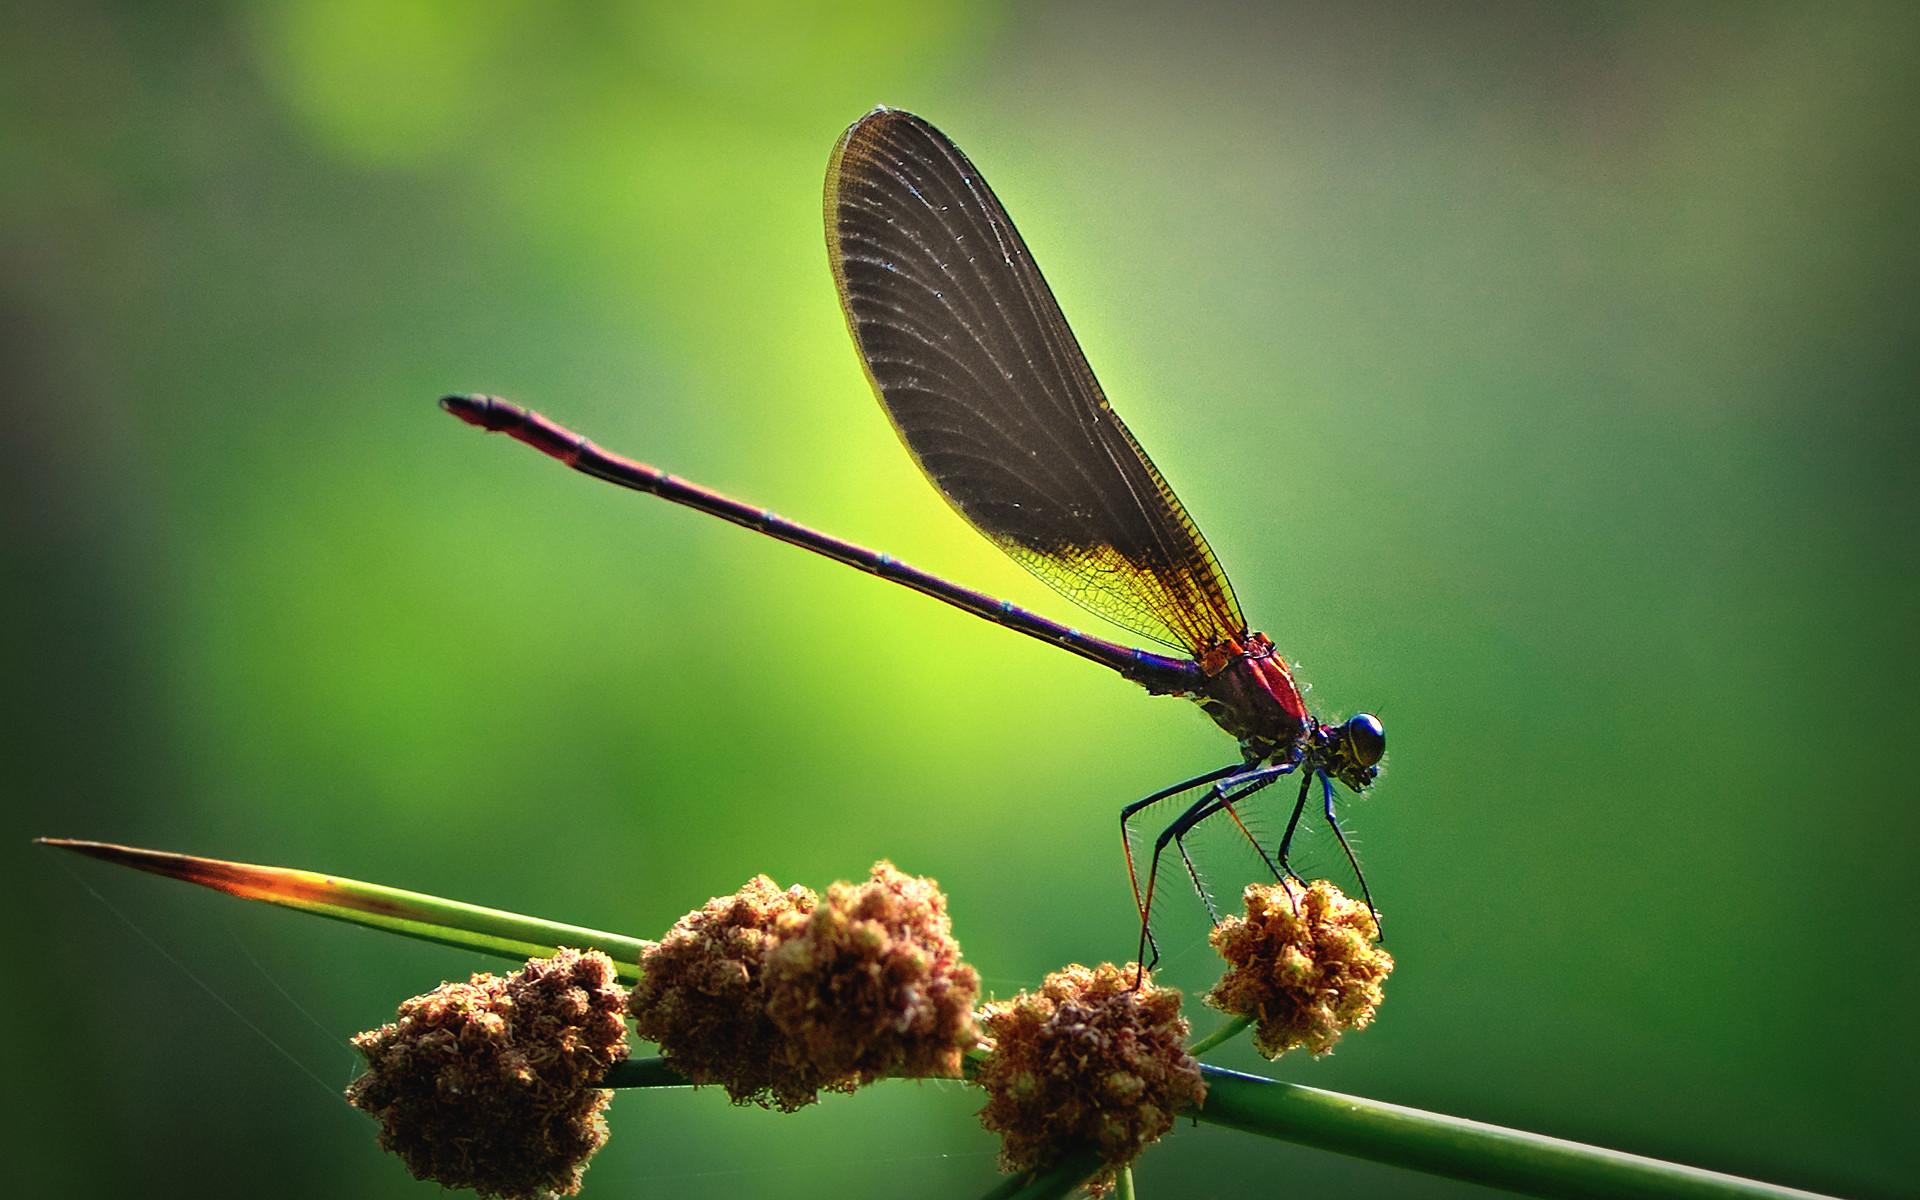 природа животные макро стрекоза трава бесплатно